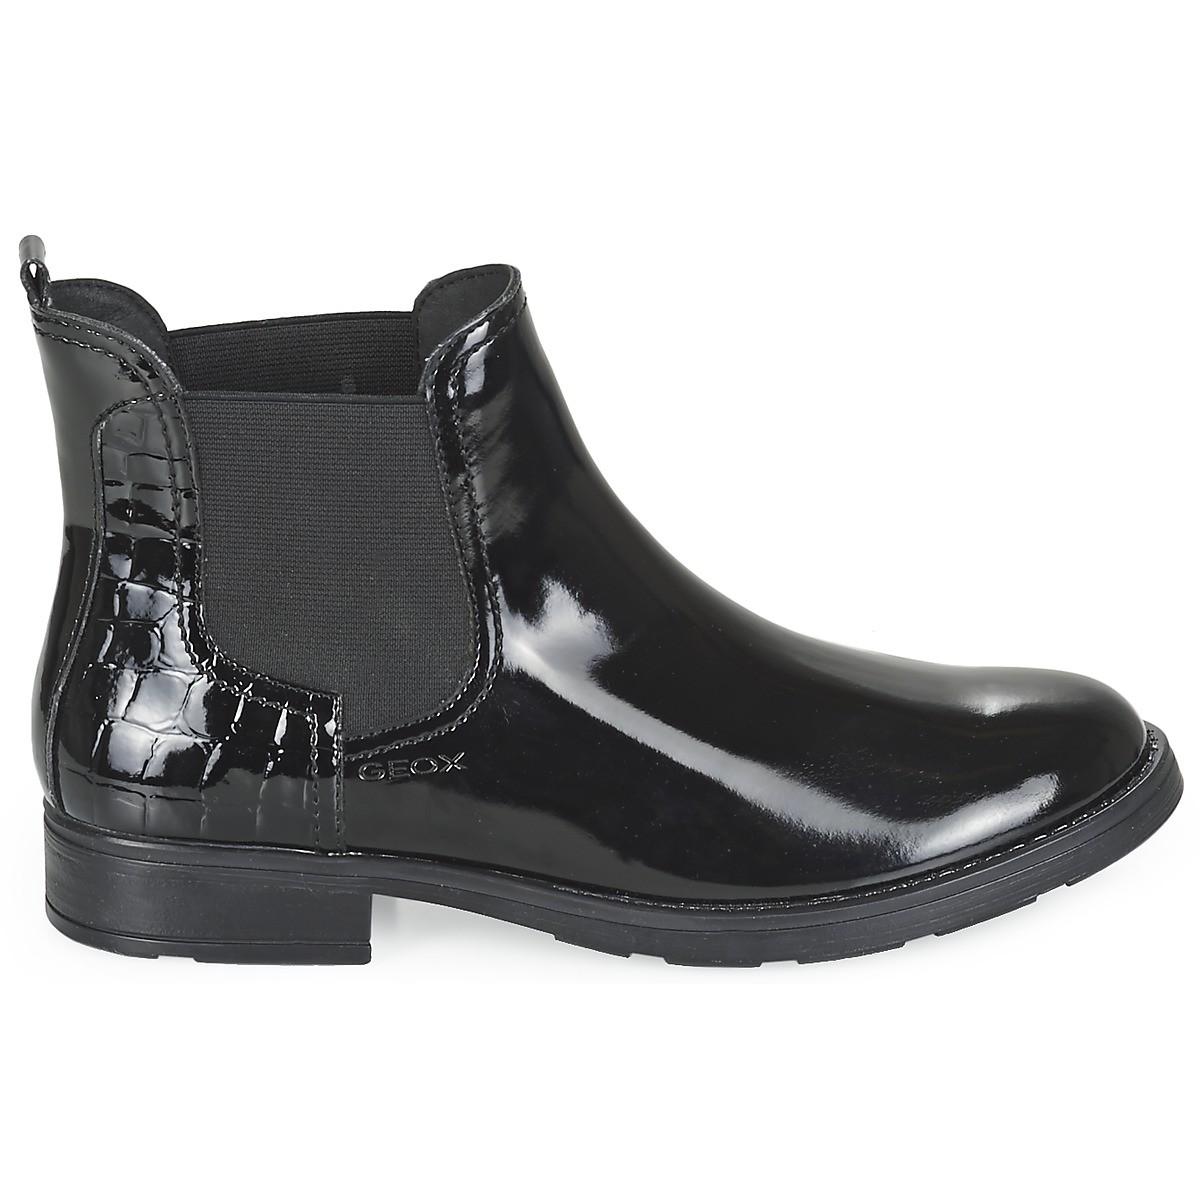 Timberland Boot allacciati allington 6 lace up boot, nabuk